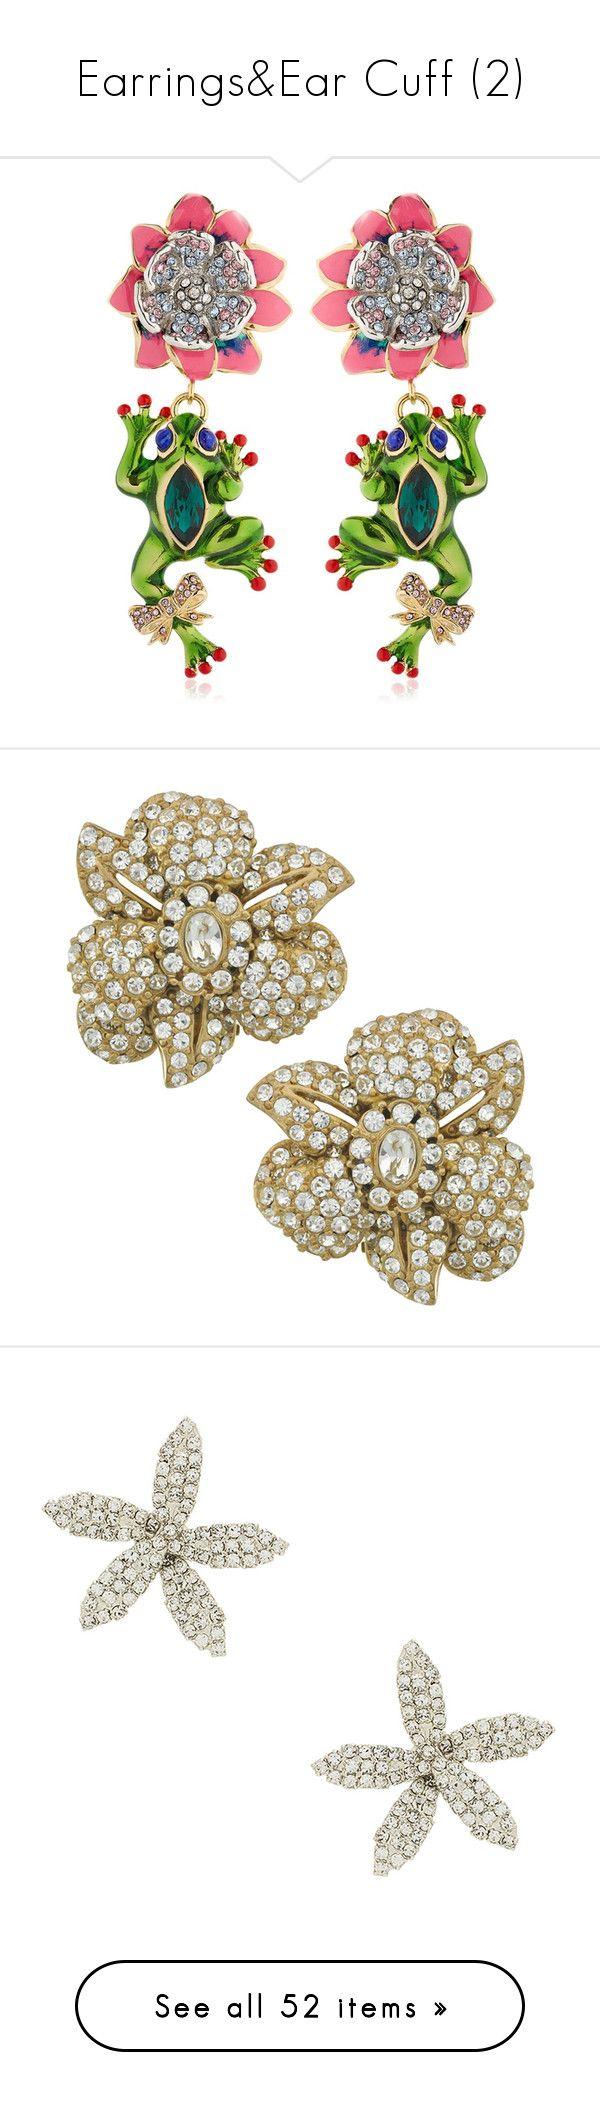 """Earrings&Ear Cuff (2)"" by taught-to-dream on Polyvore featuring jewelry, earrings, nickel free earrings, earring jewelry, casadei, swarovski crystal earrings, nickel free jewelry, gold flower earrings, crystal jewellery e gold jewelry"